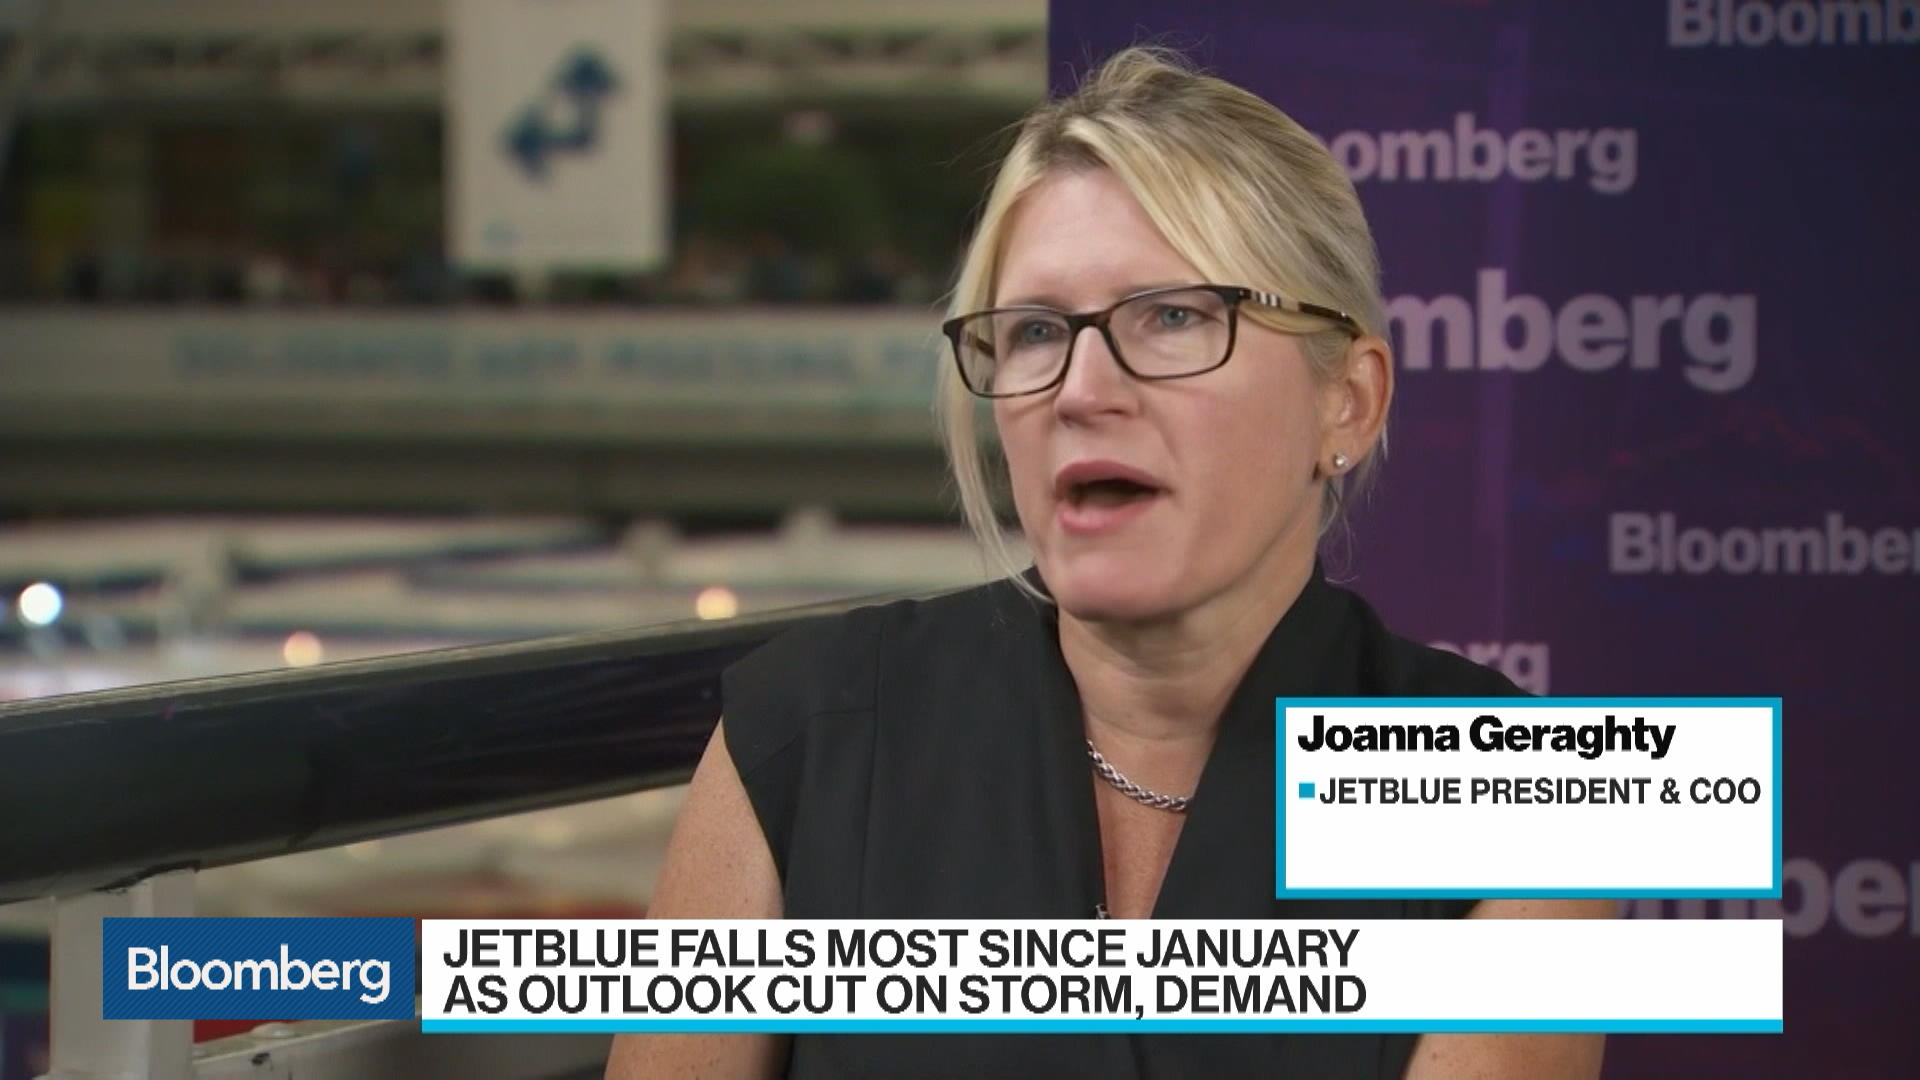 Jetblue Airways COO Joanna Geraghty on U.S. Demand, Transatlantic Service to U.K.